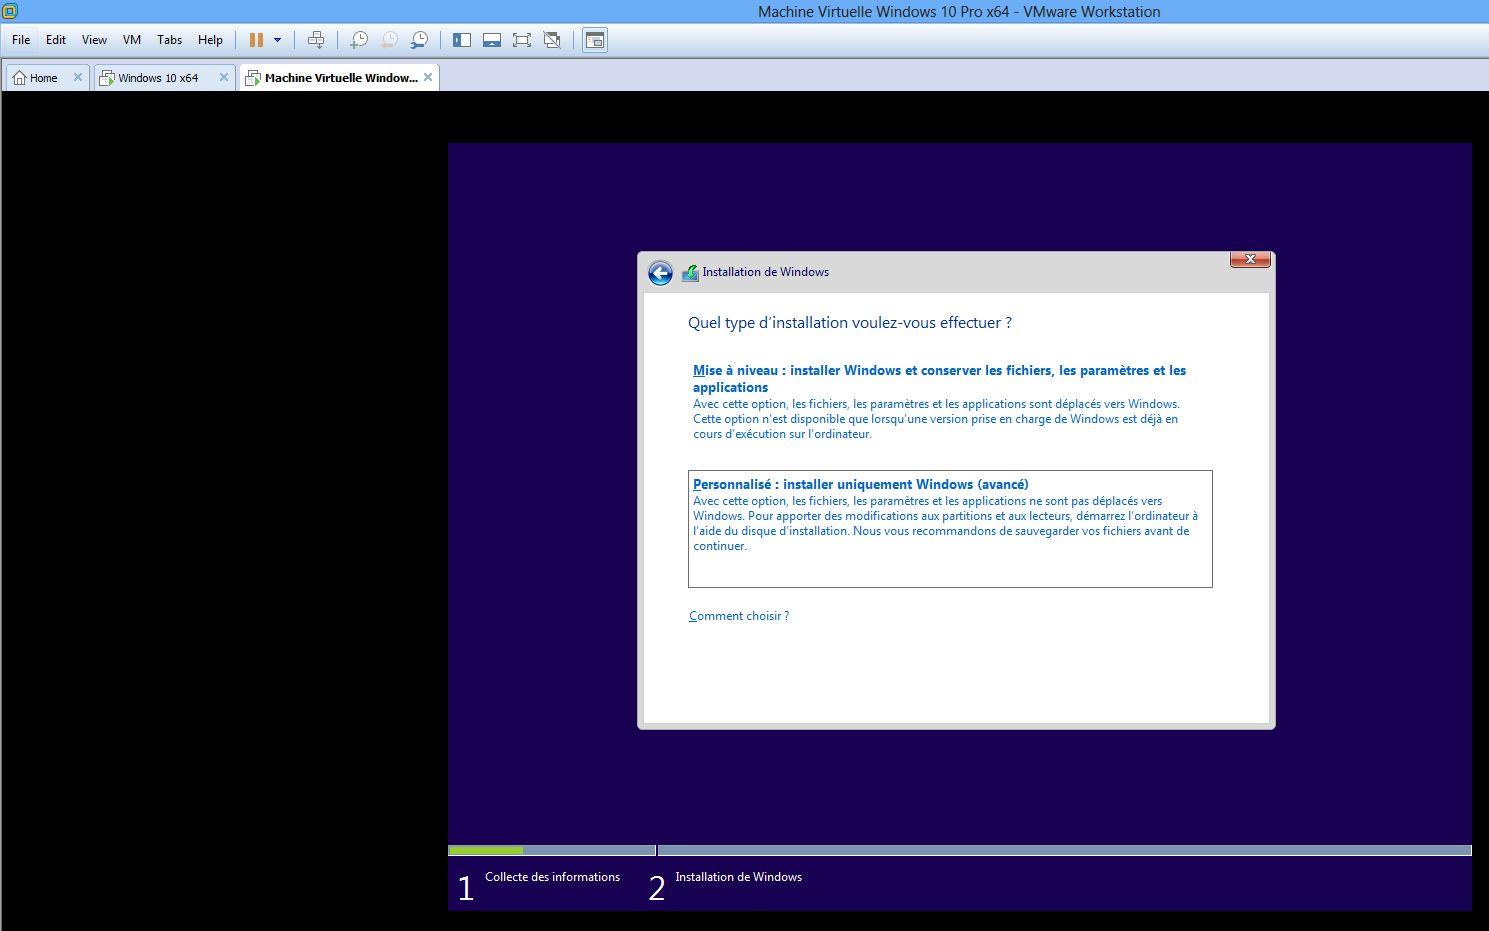 Ecran installation personnalisée Windows 10 Pro x64